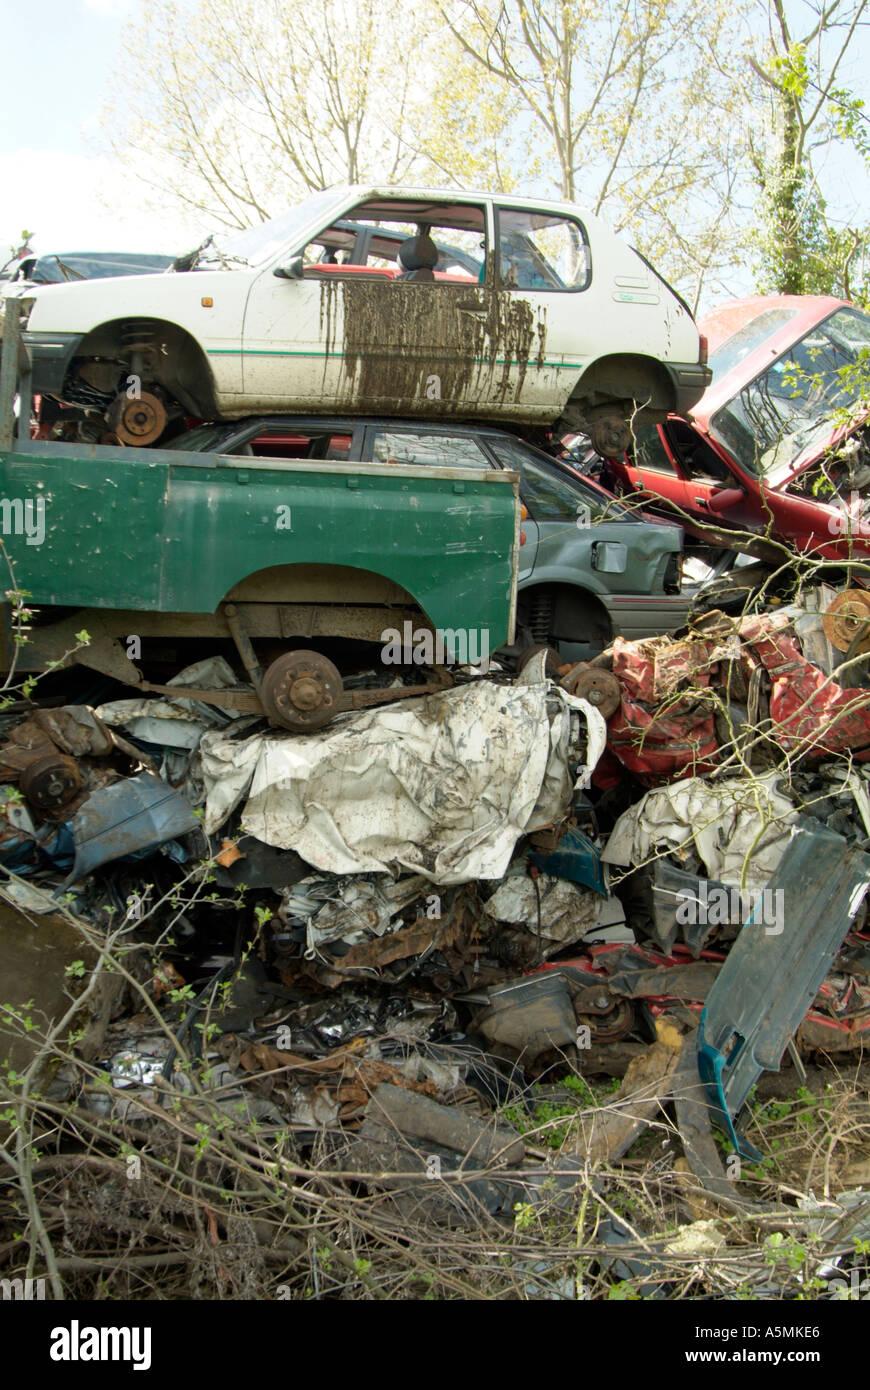 scrap car oil junk scrap scrapyard junk yard junkyard trash rubbish ...